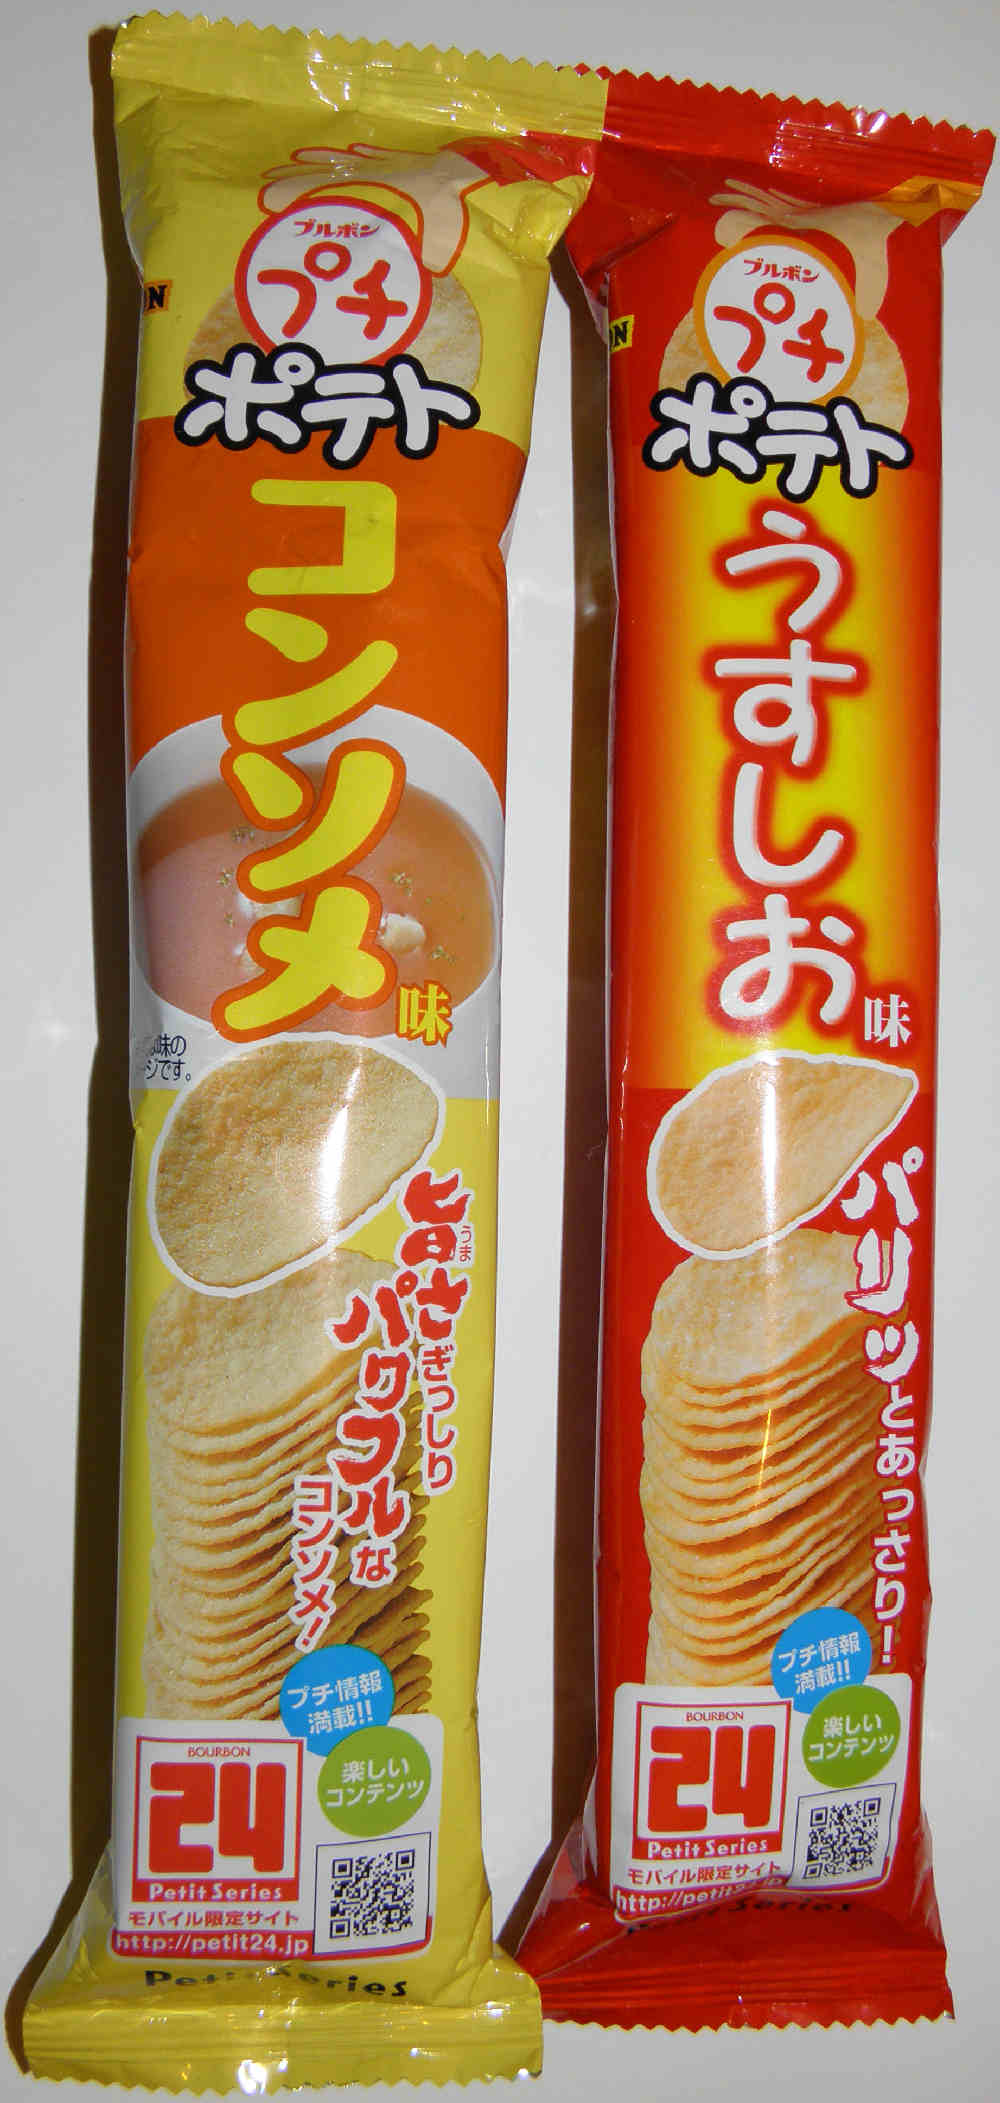 patatas-fritas-japonesas-japon